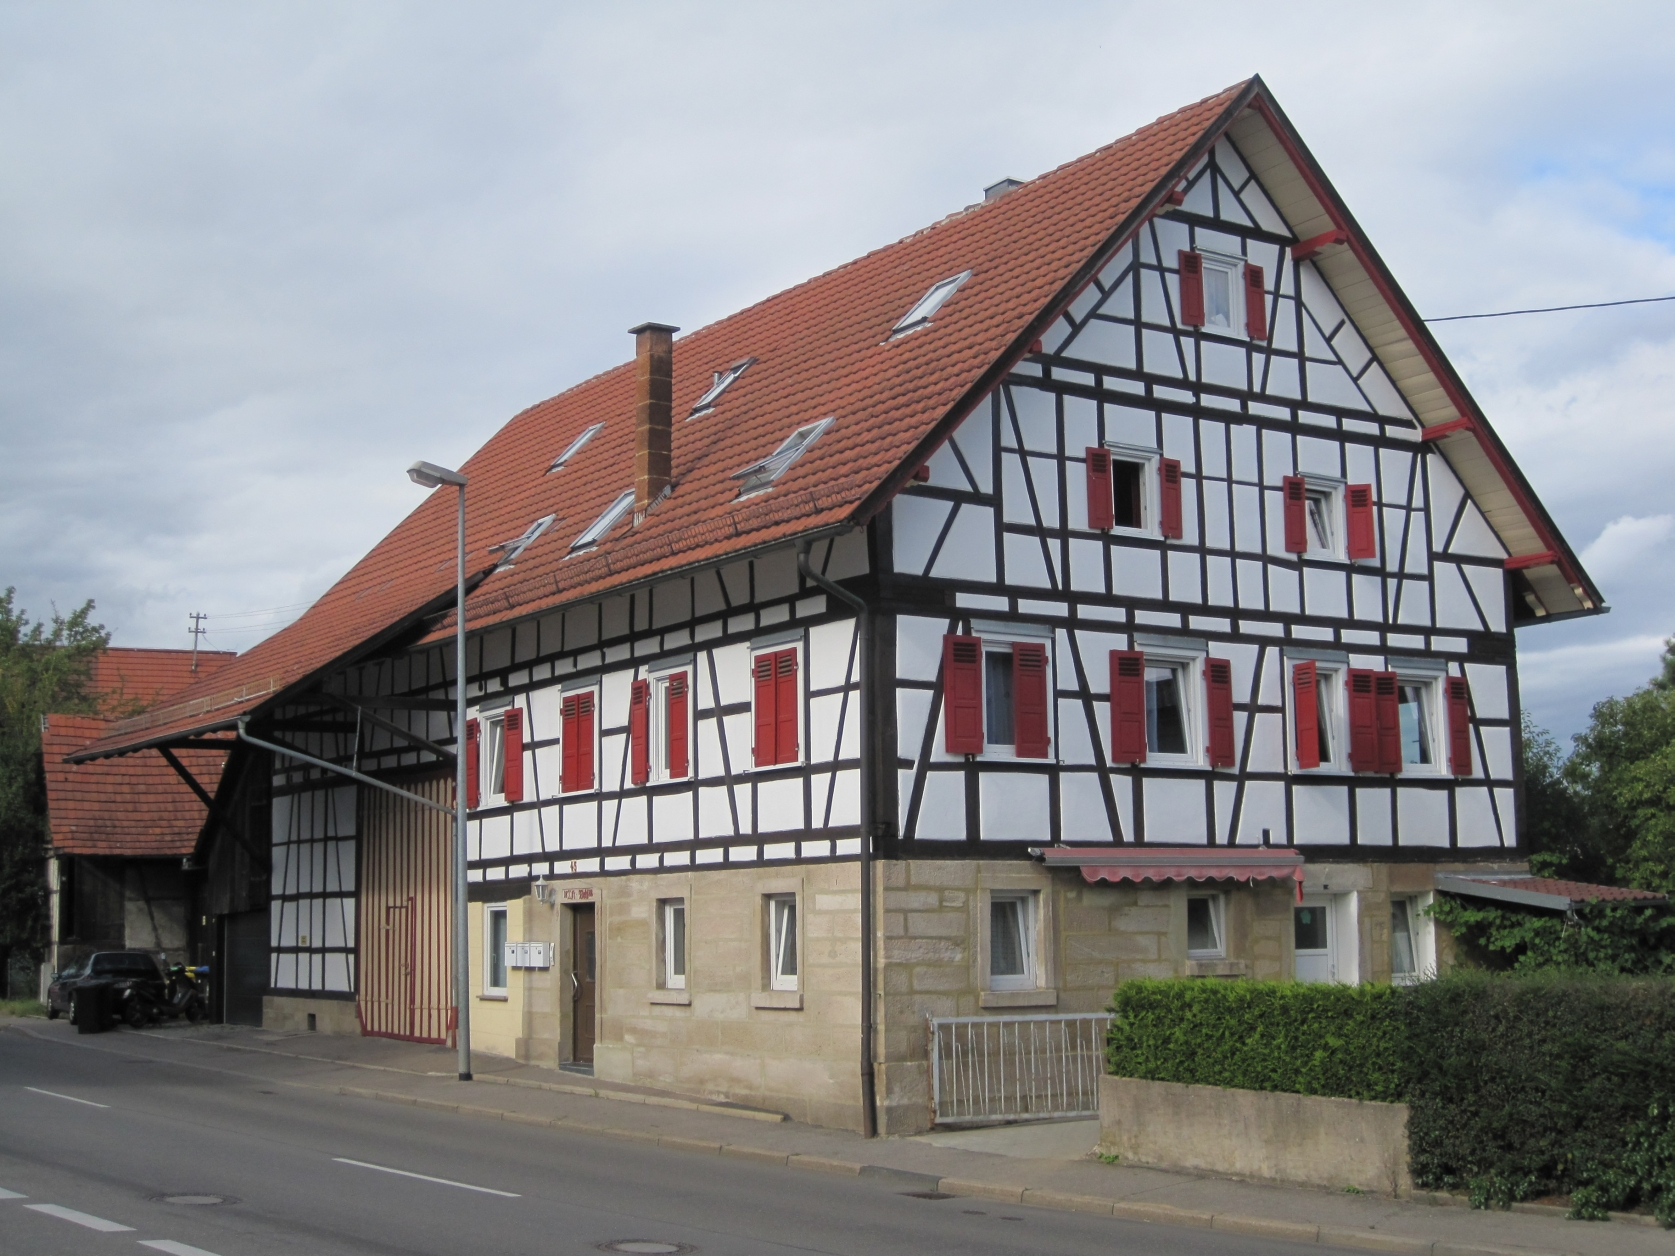 Leinfelden-Echterdingen Germany  city photos gallery : Beschreibung Leinfelden Echterdingen OT Stetten Bauernhaus 01